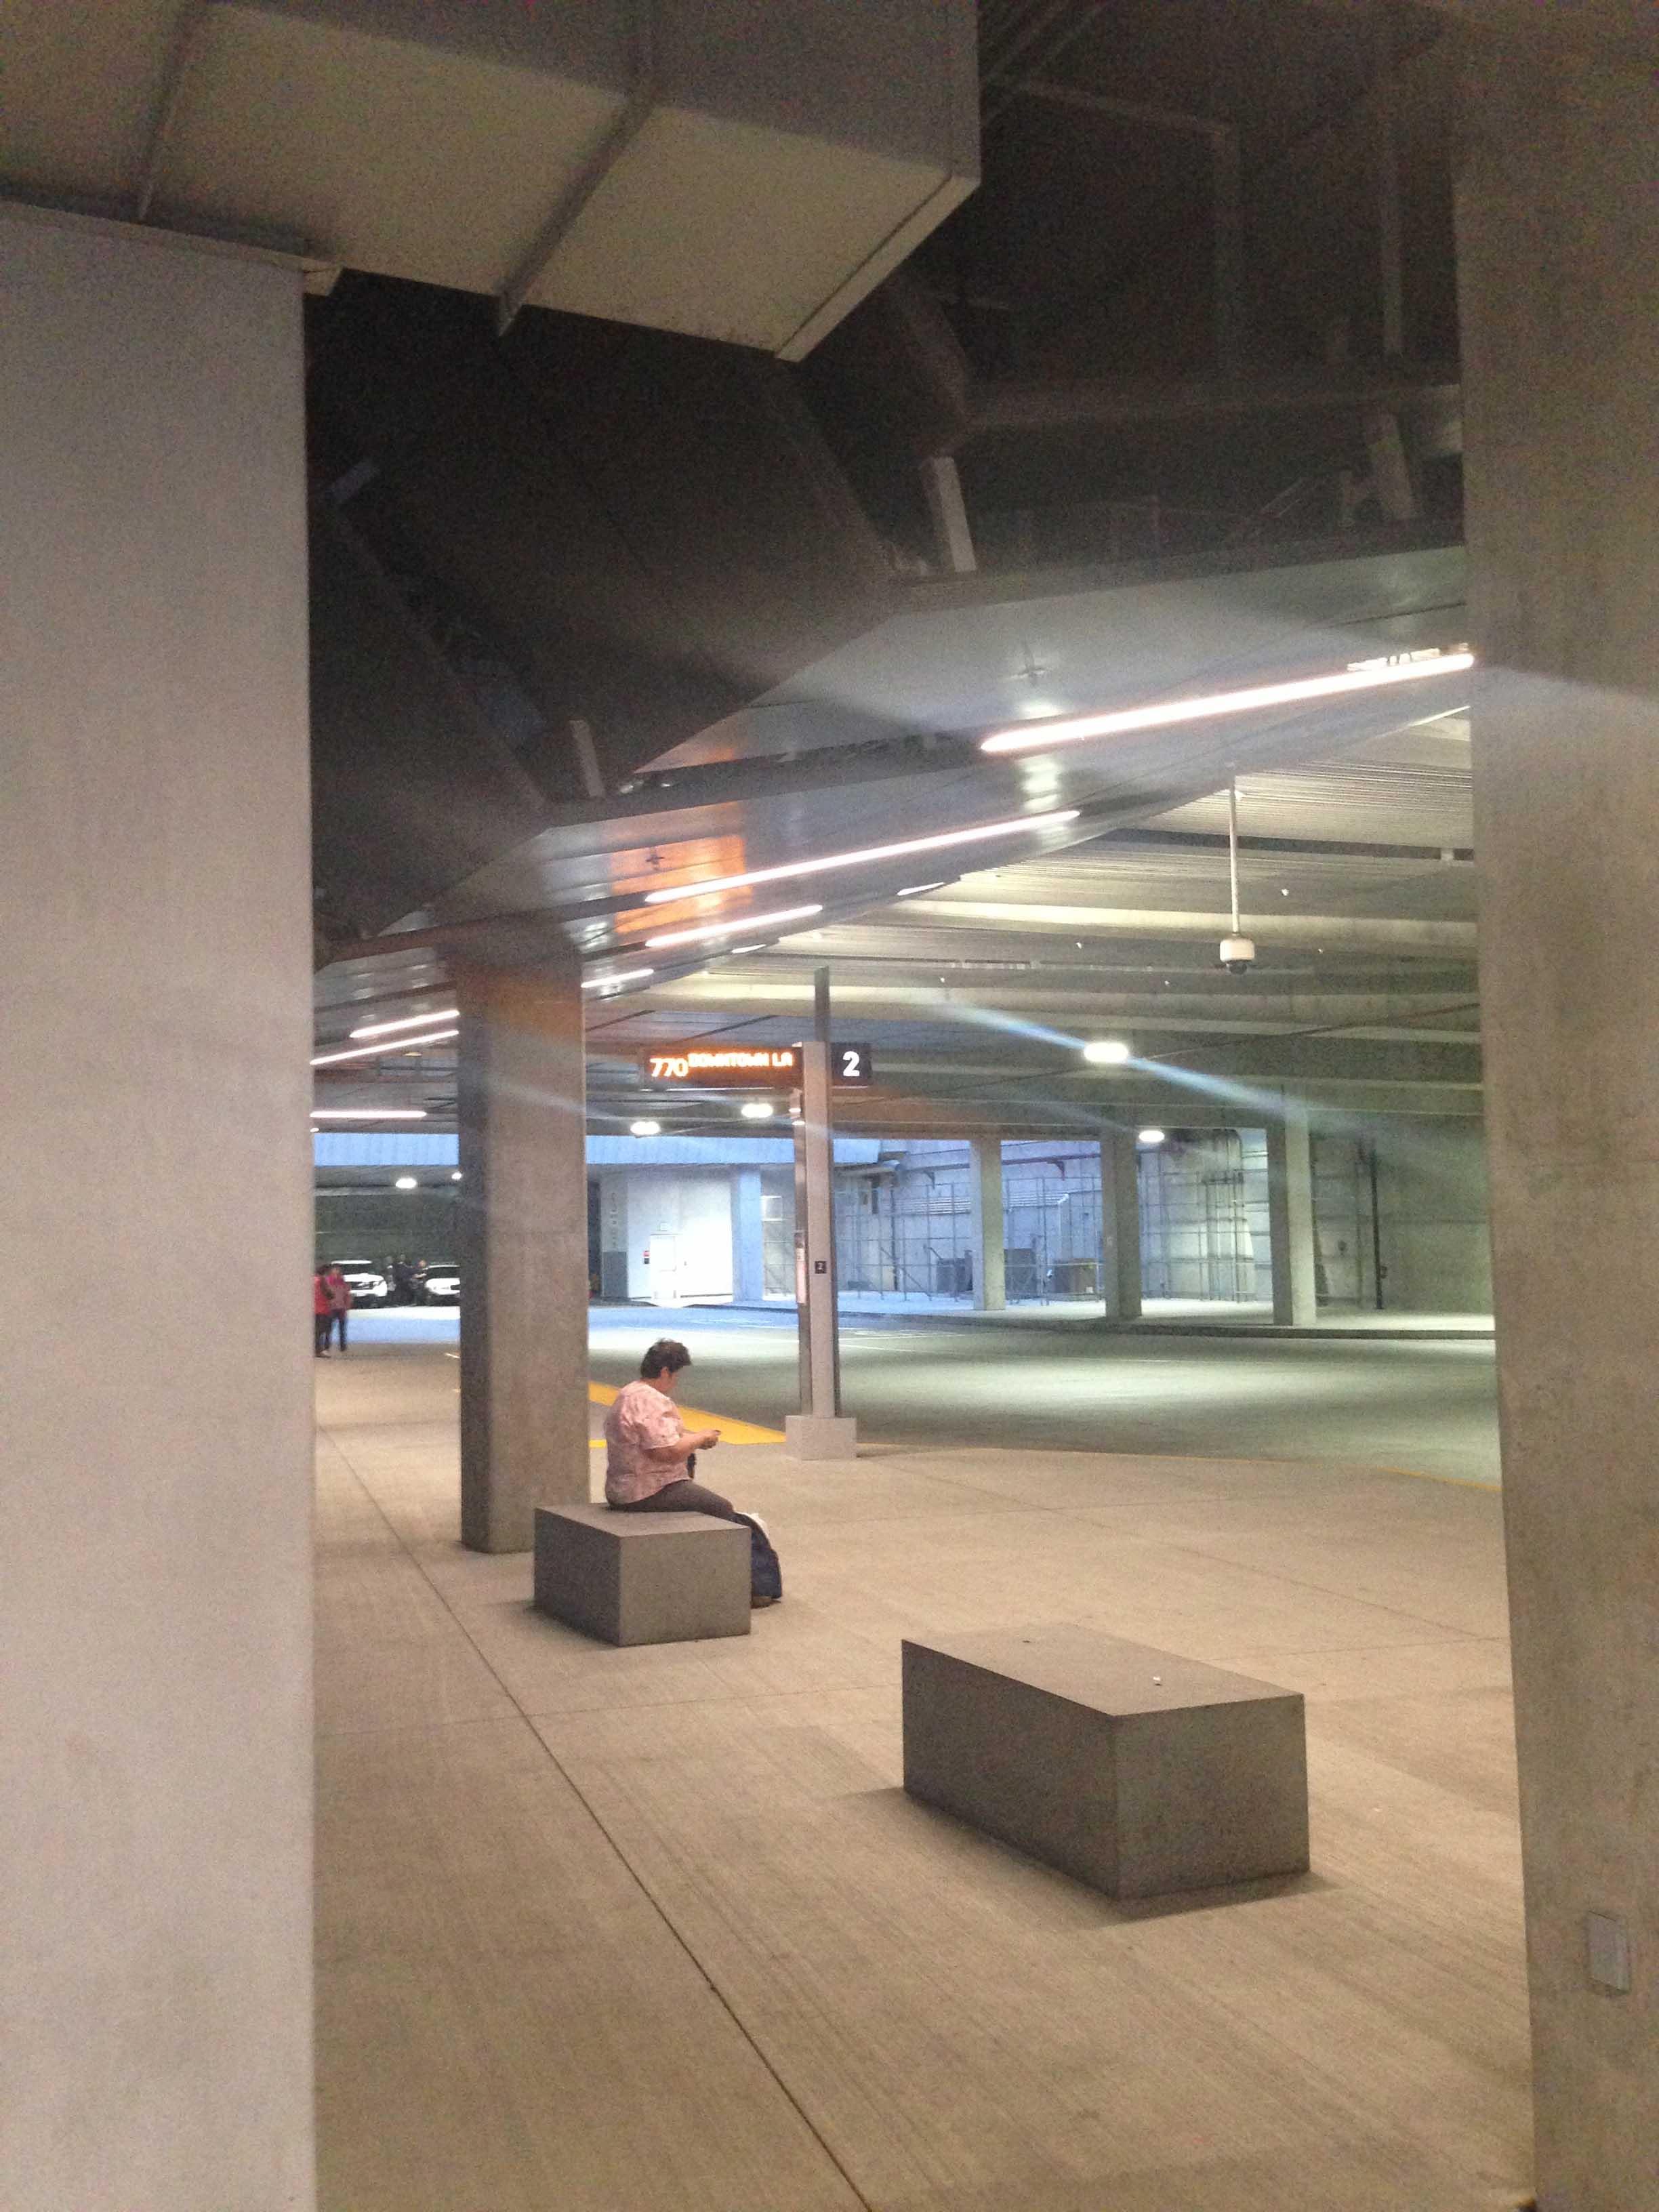 Concourse Waiting Area